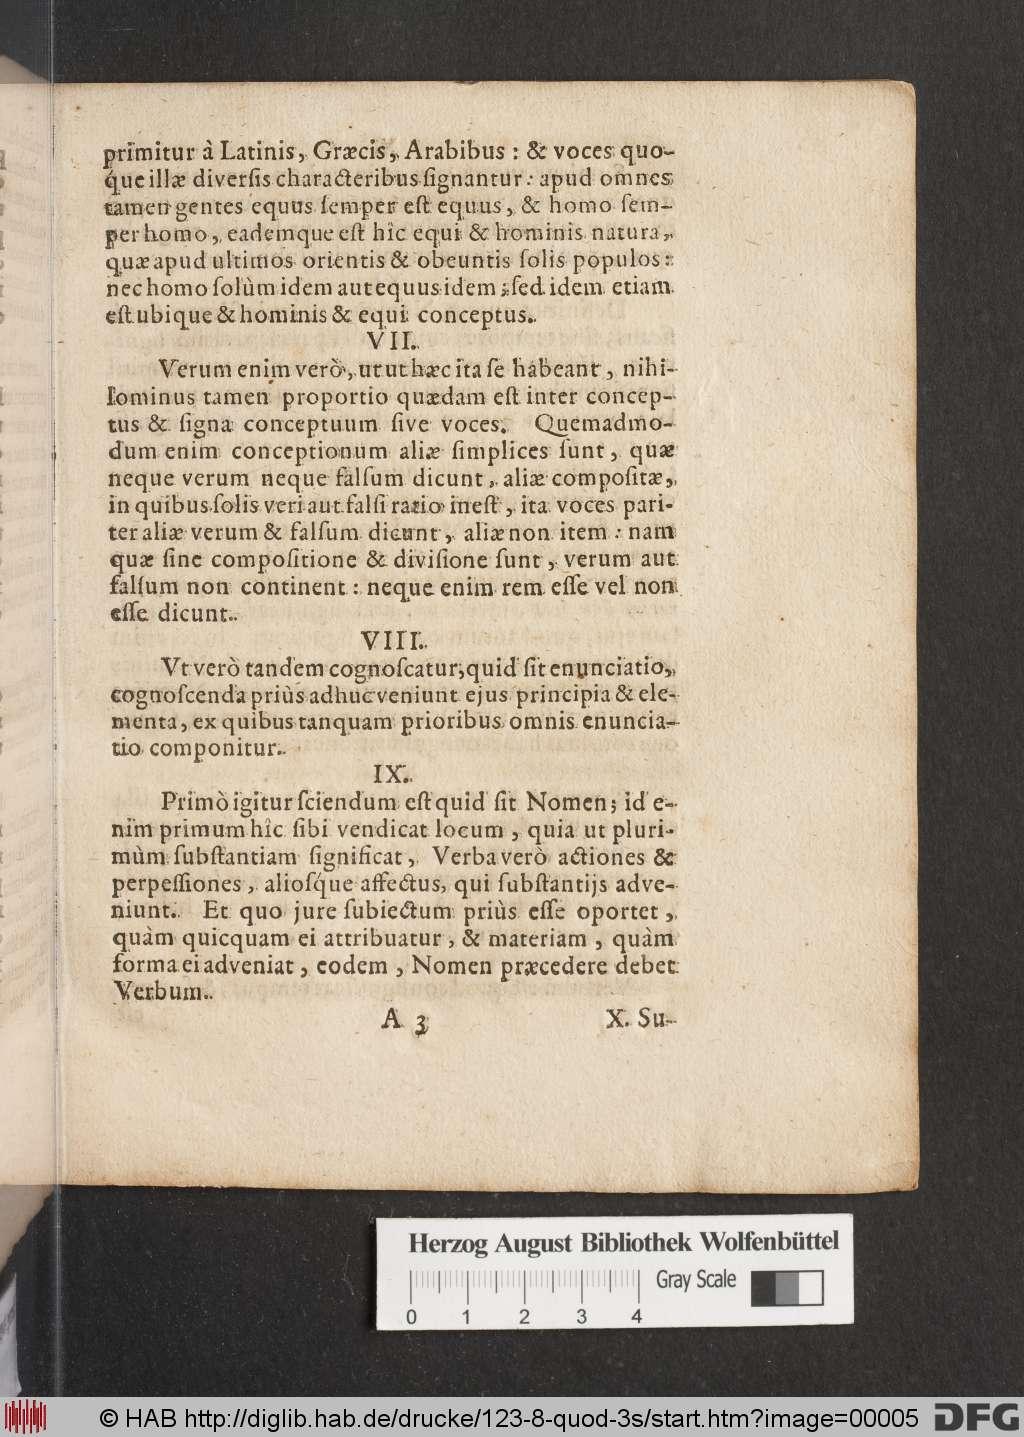 http://diglib.hab.de/drucke/123-8-quod-3s/00005.jpg